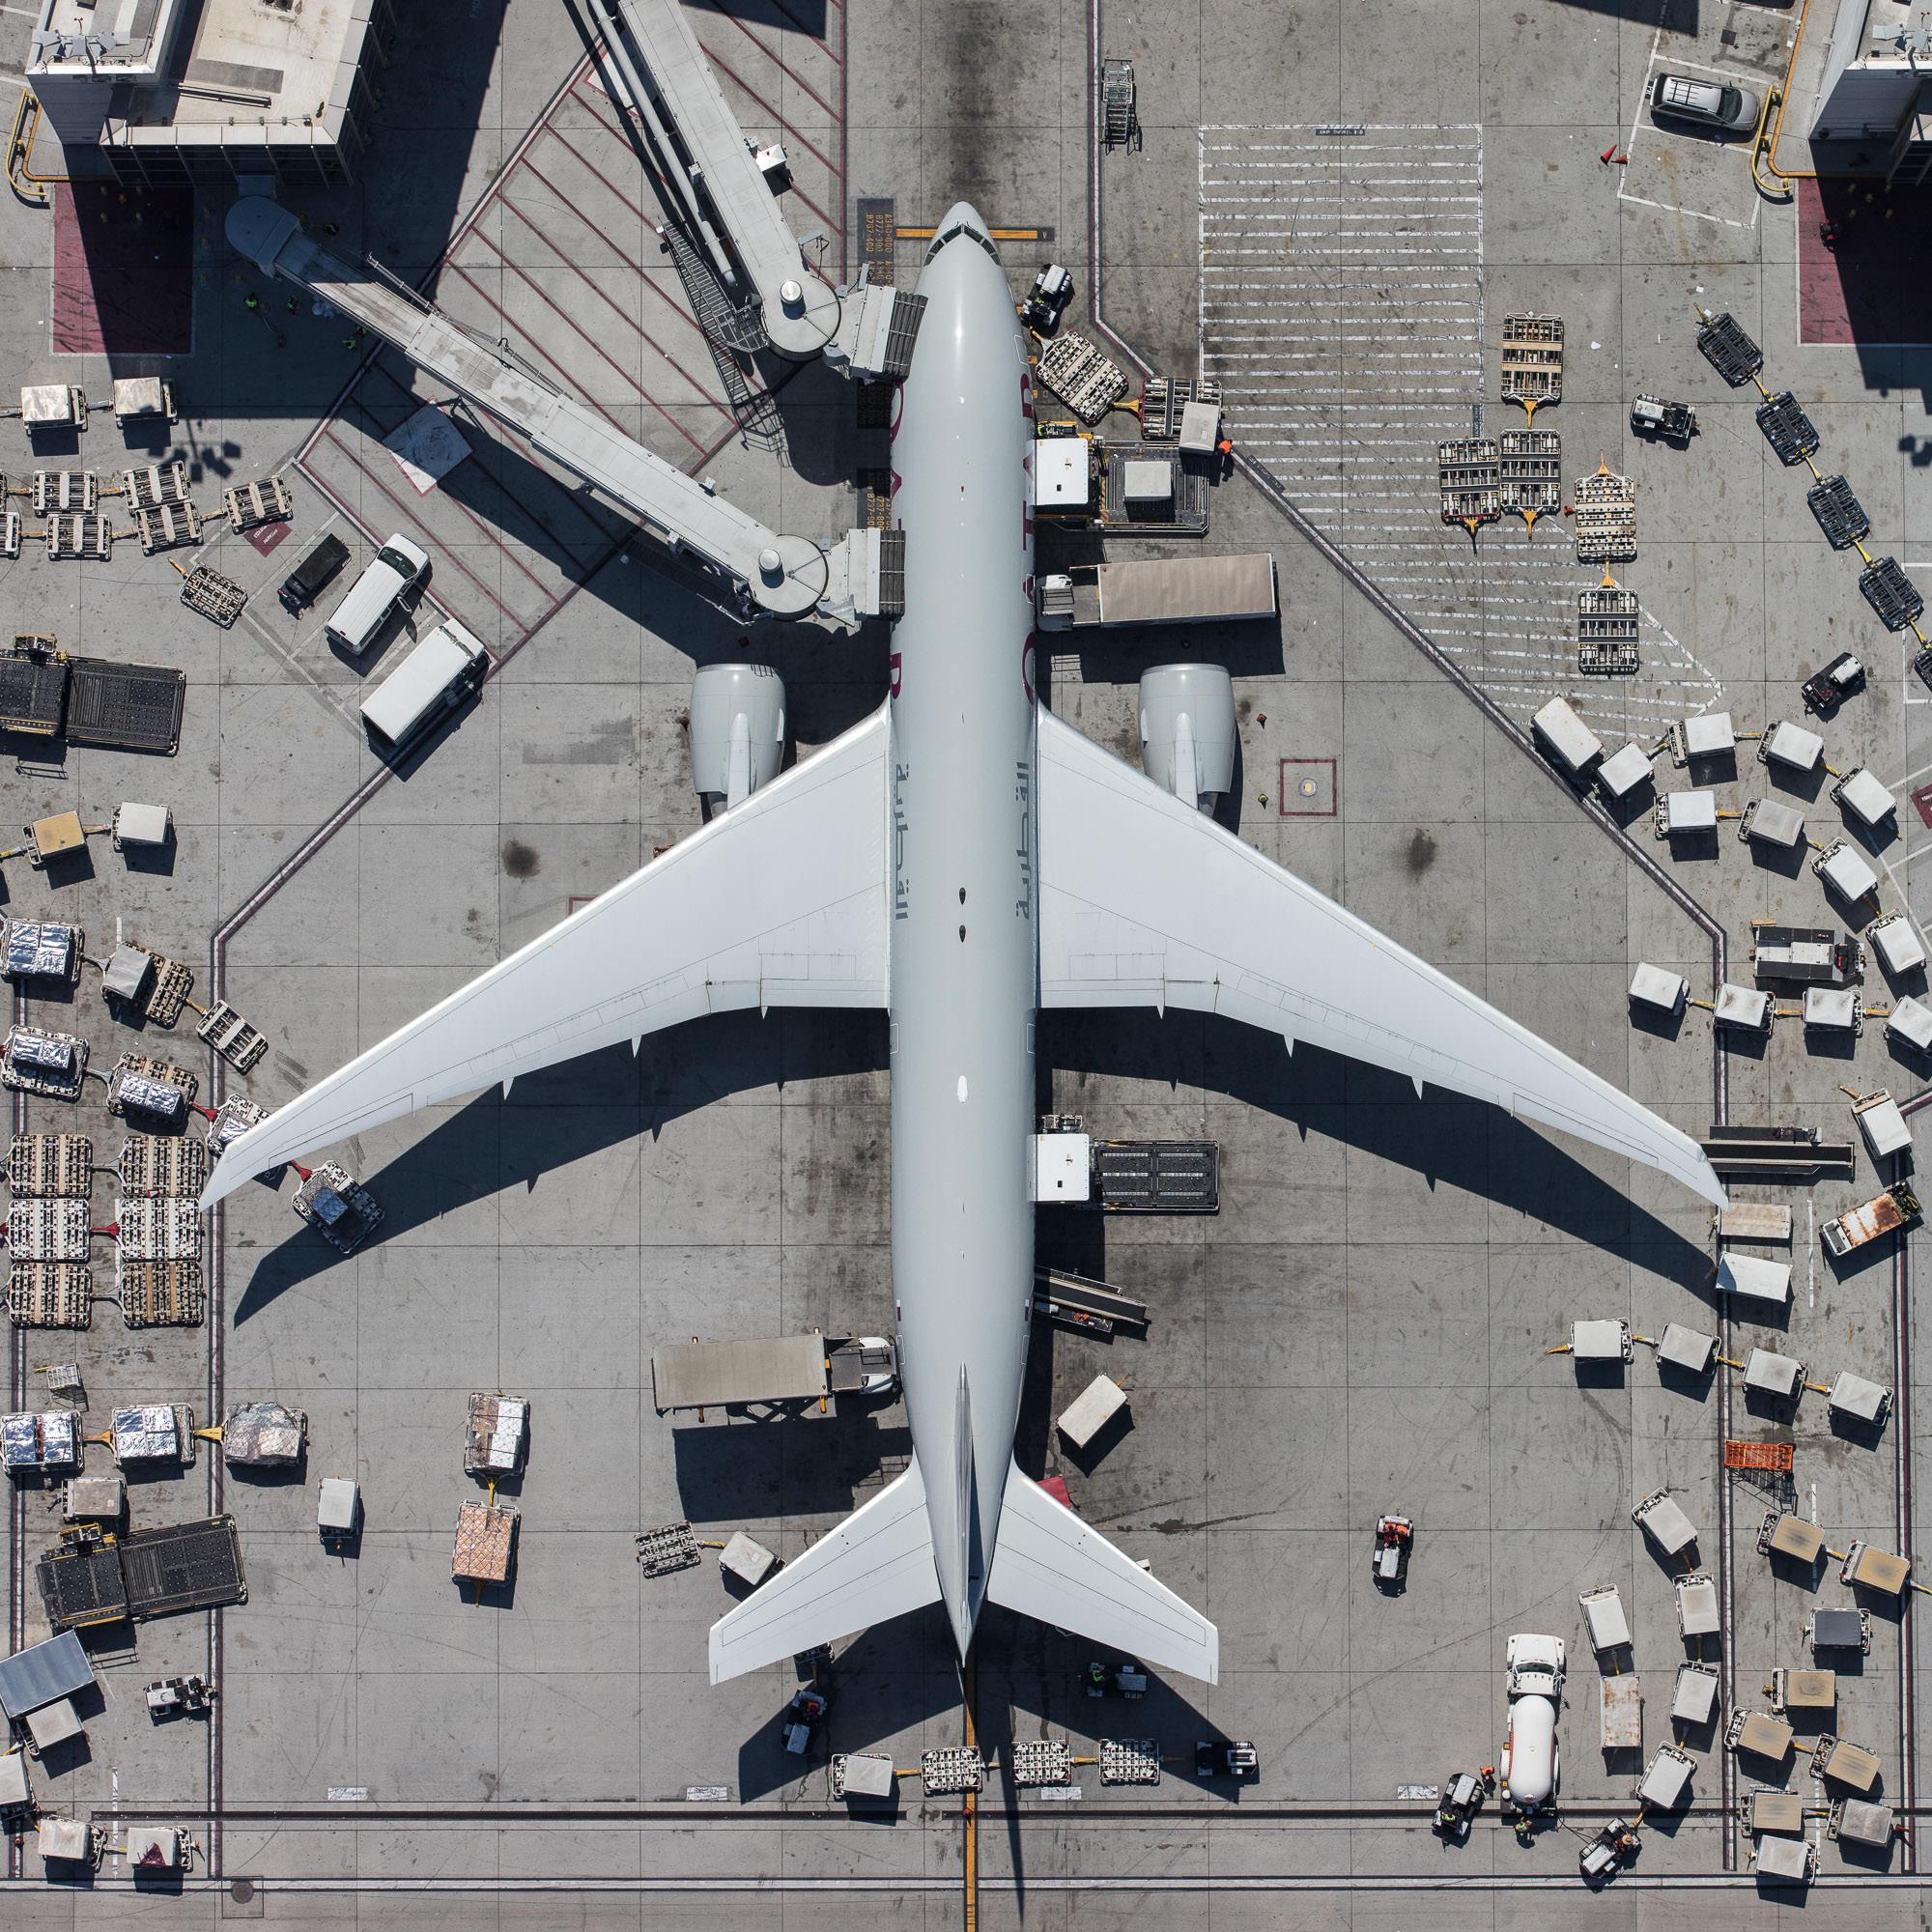 mike-kelley-life-cycles-aviation-6.jpg